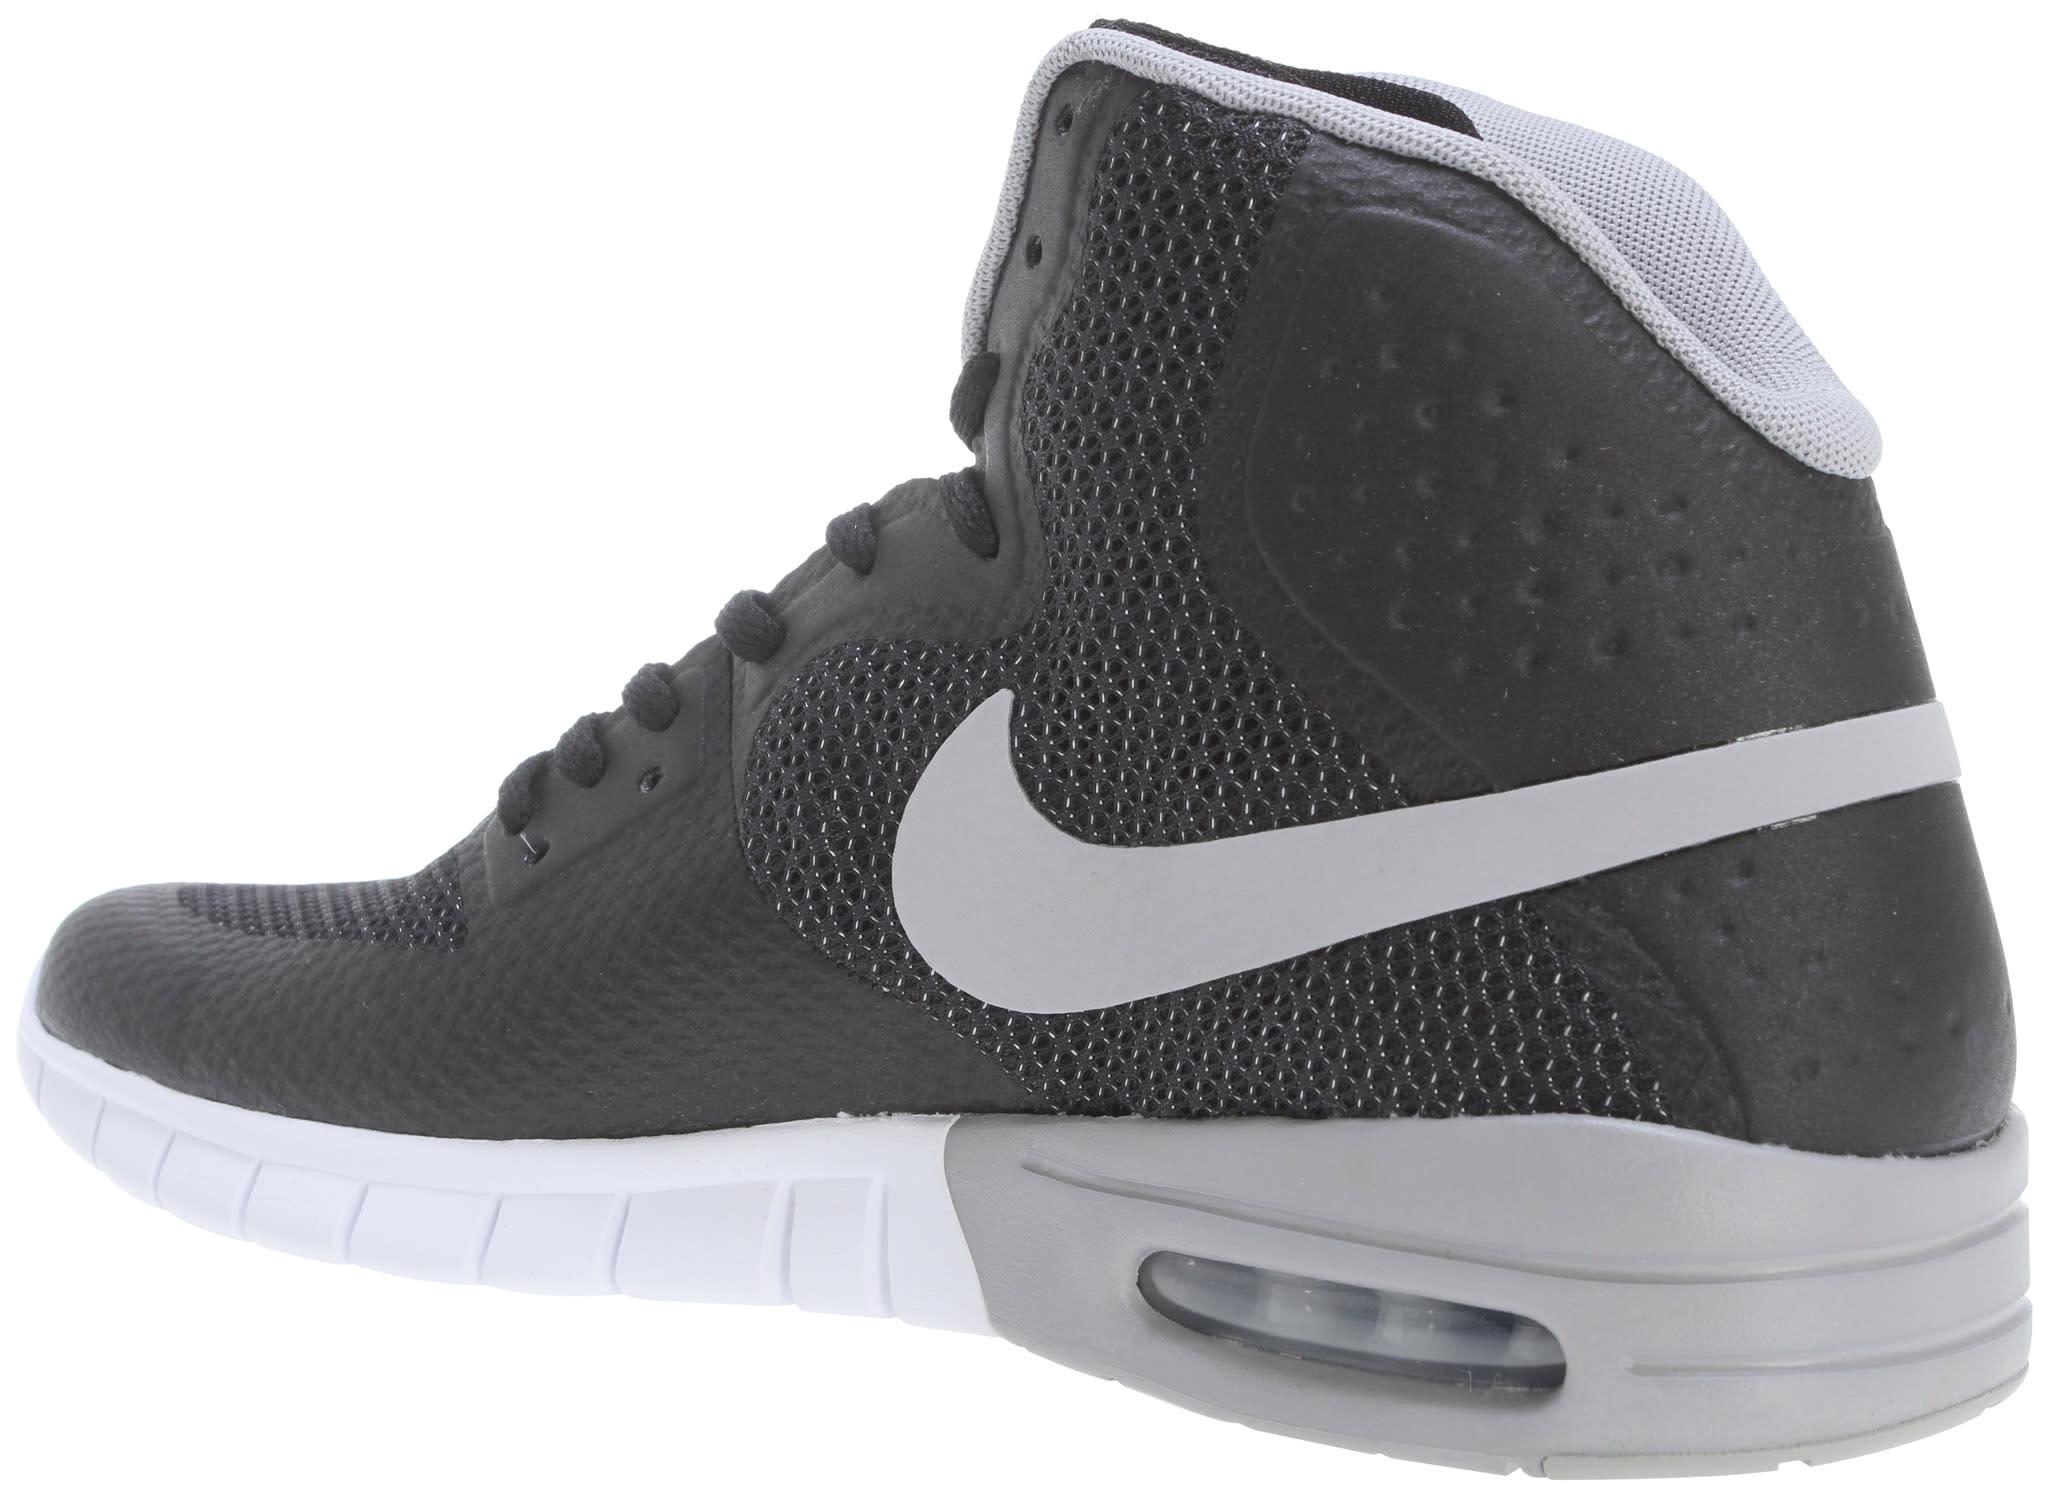 0555230bc19 Nike Paul Rodriguez 7 Skate Shoes - thumbnail 3